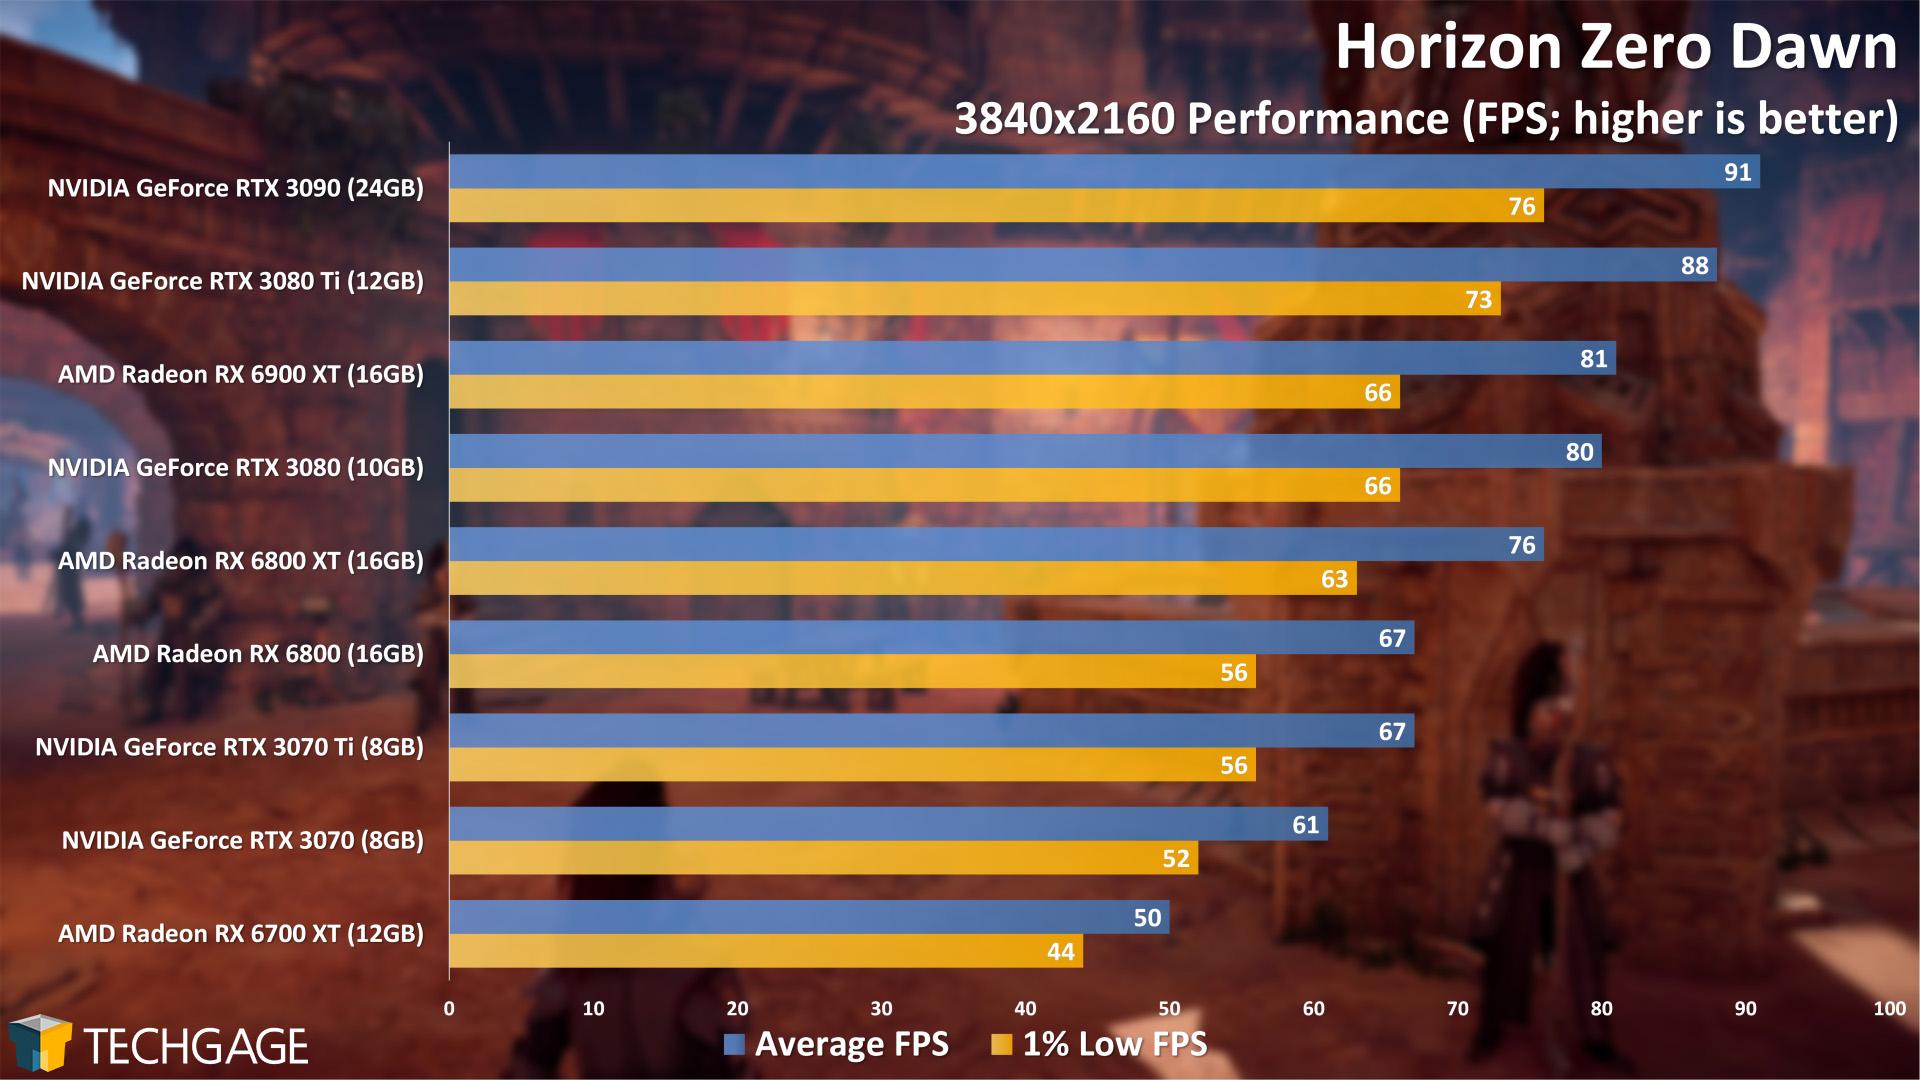 Horizon Zero Dawn - 2160p Performance (NVIDIA GeForce RTX 3070 Ti)